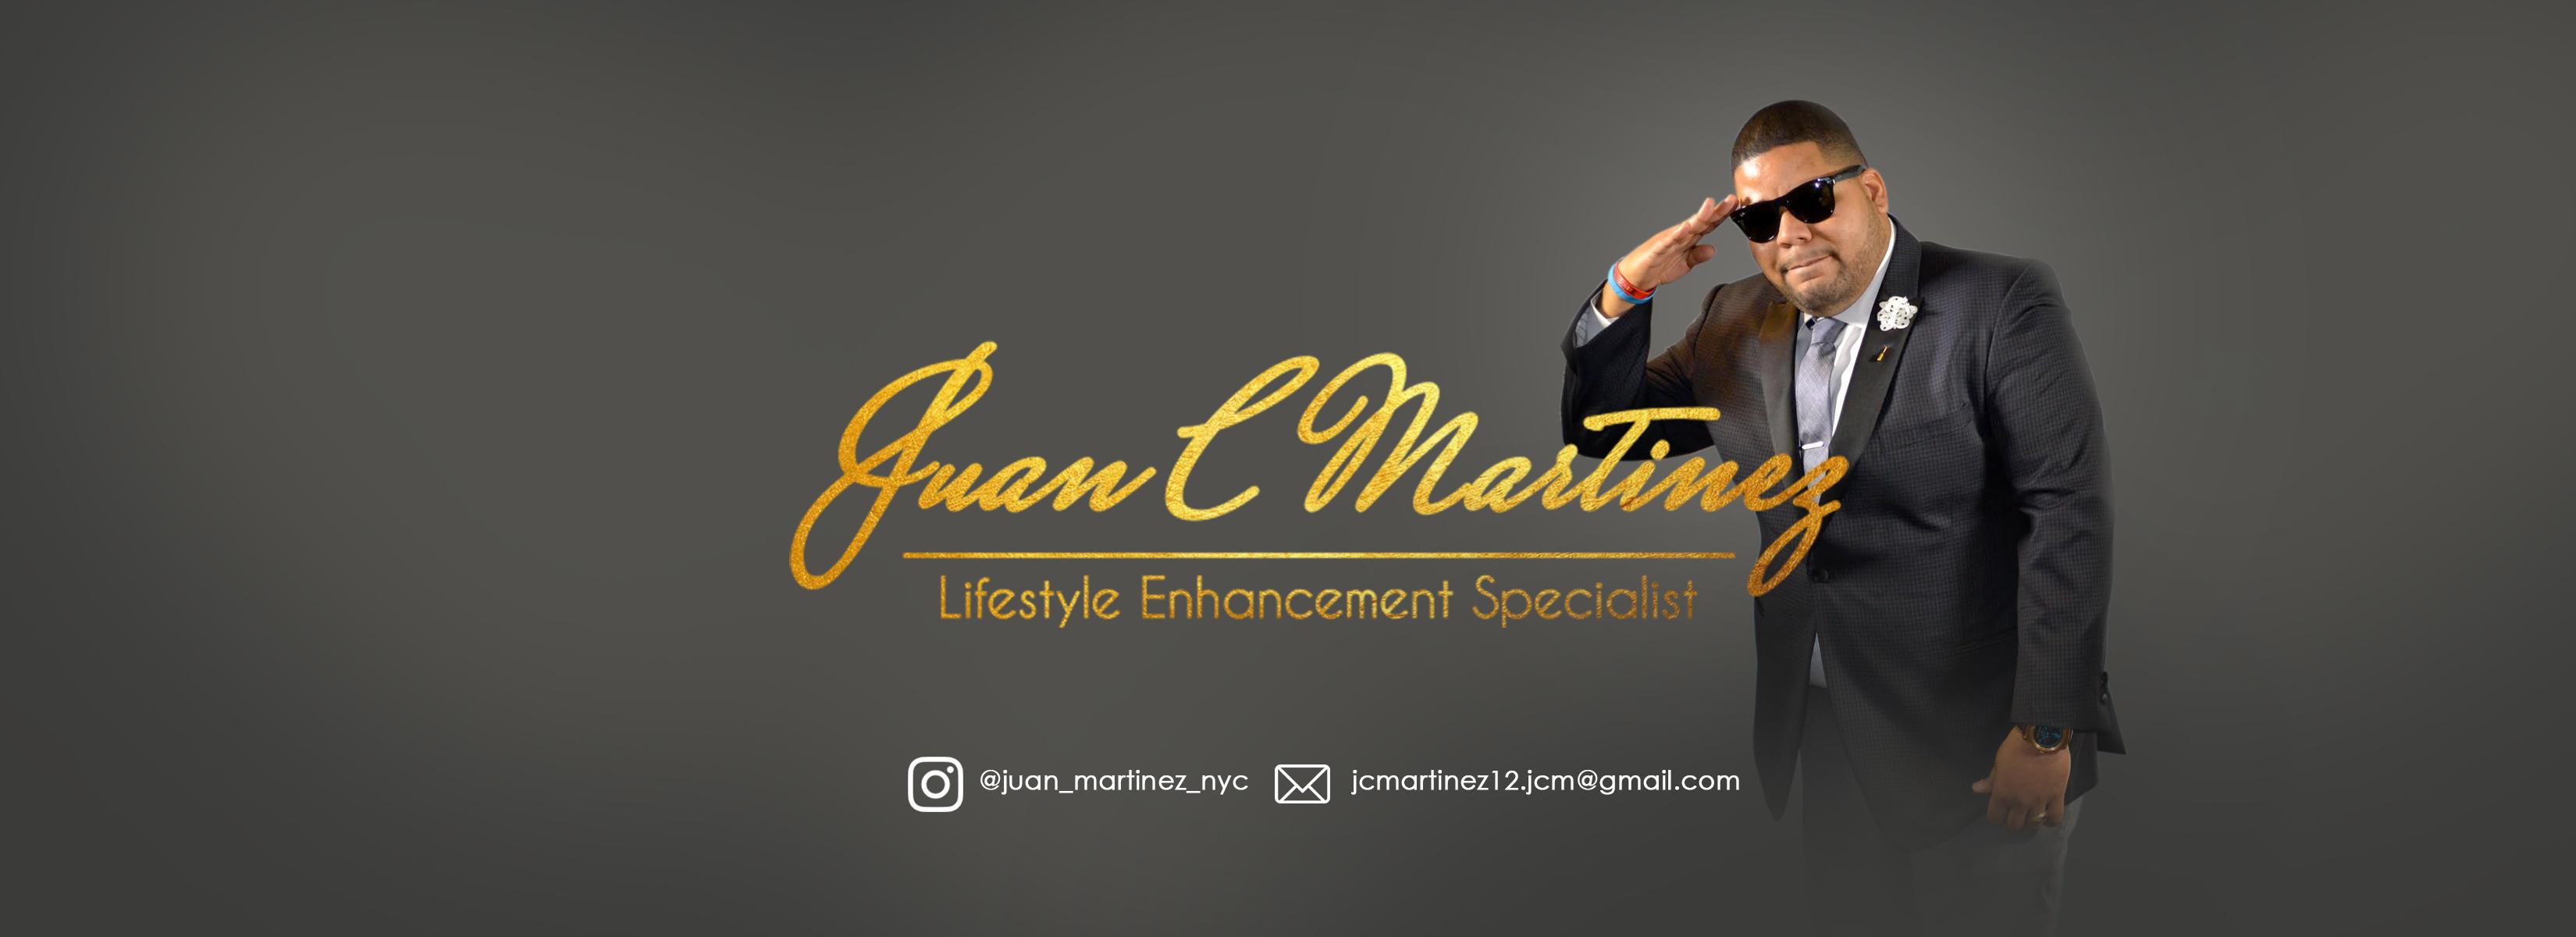 Juan C Martinez Lifestyle